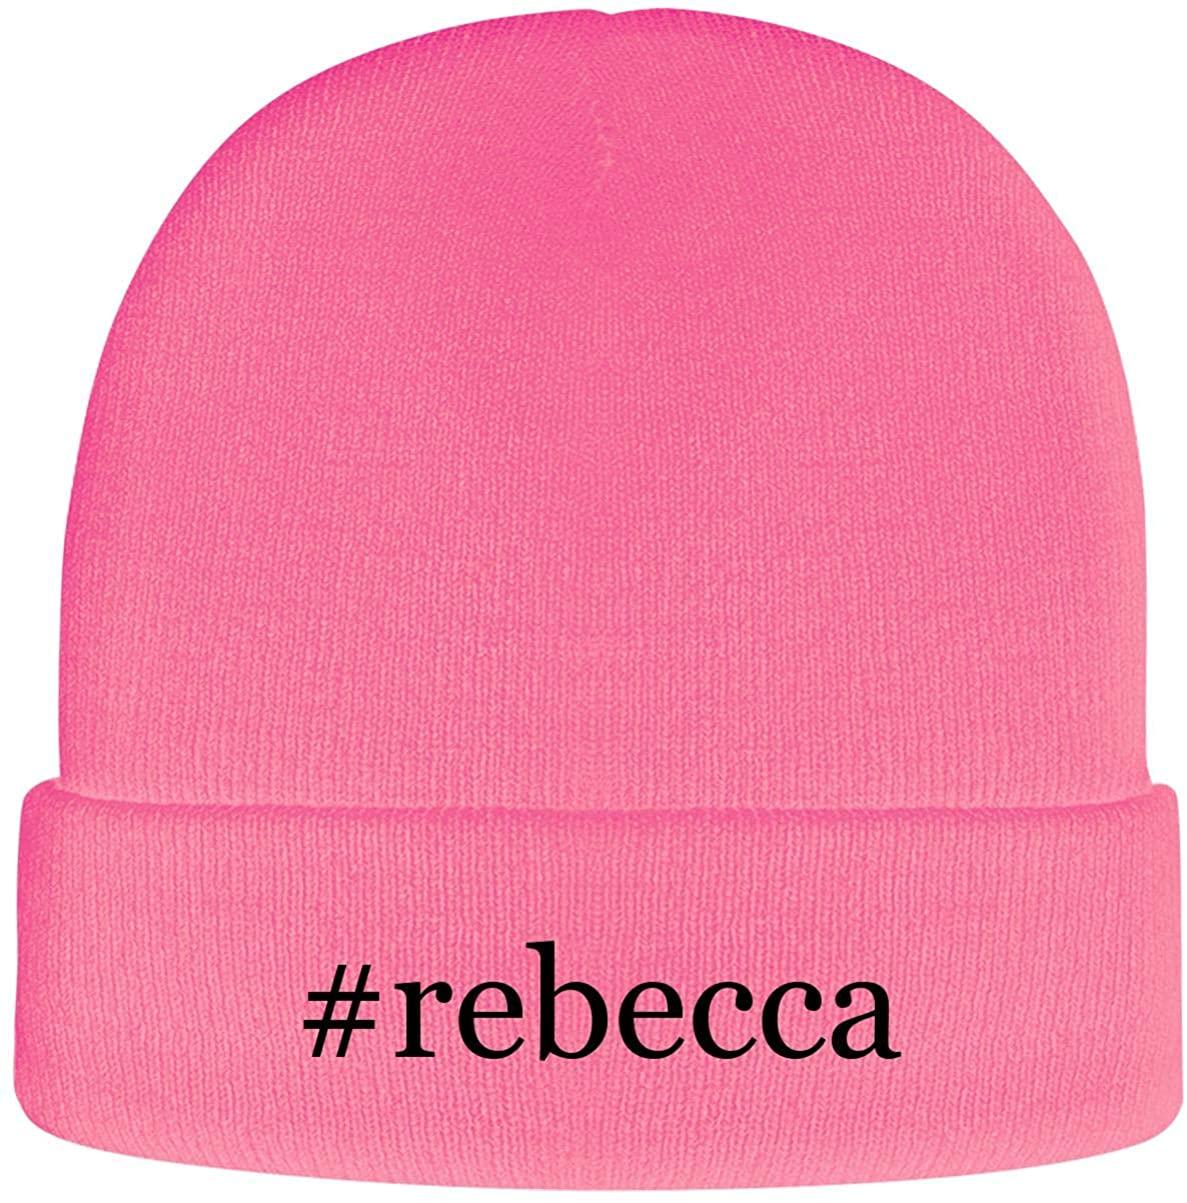 One Legging it Around #Rebecca - Soft Hashtag Adult Beanie Cap